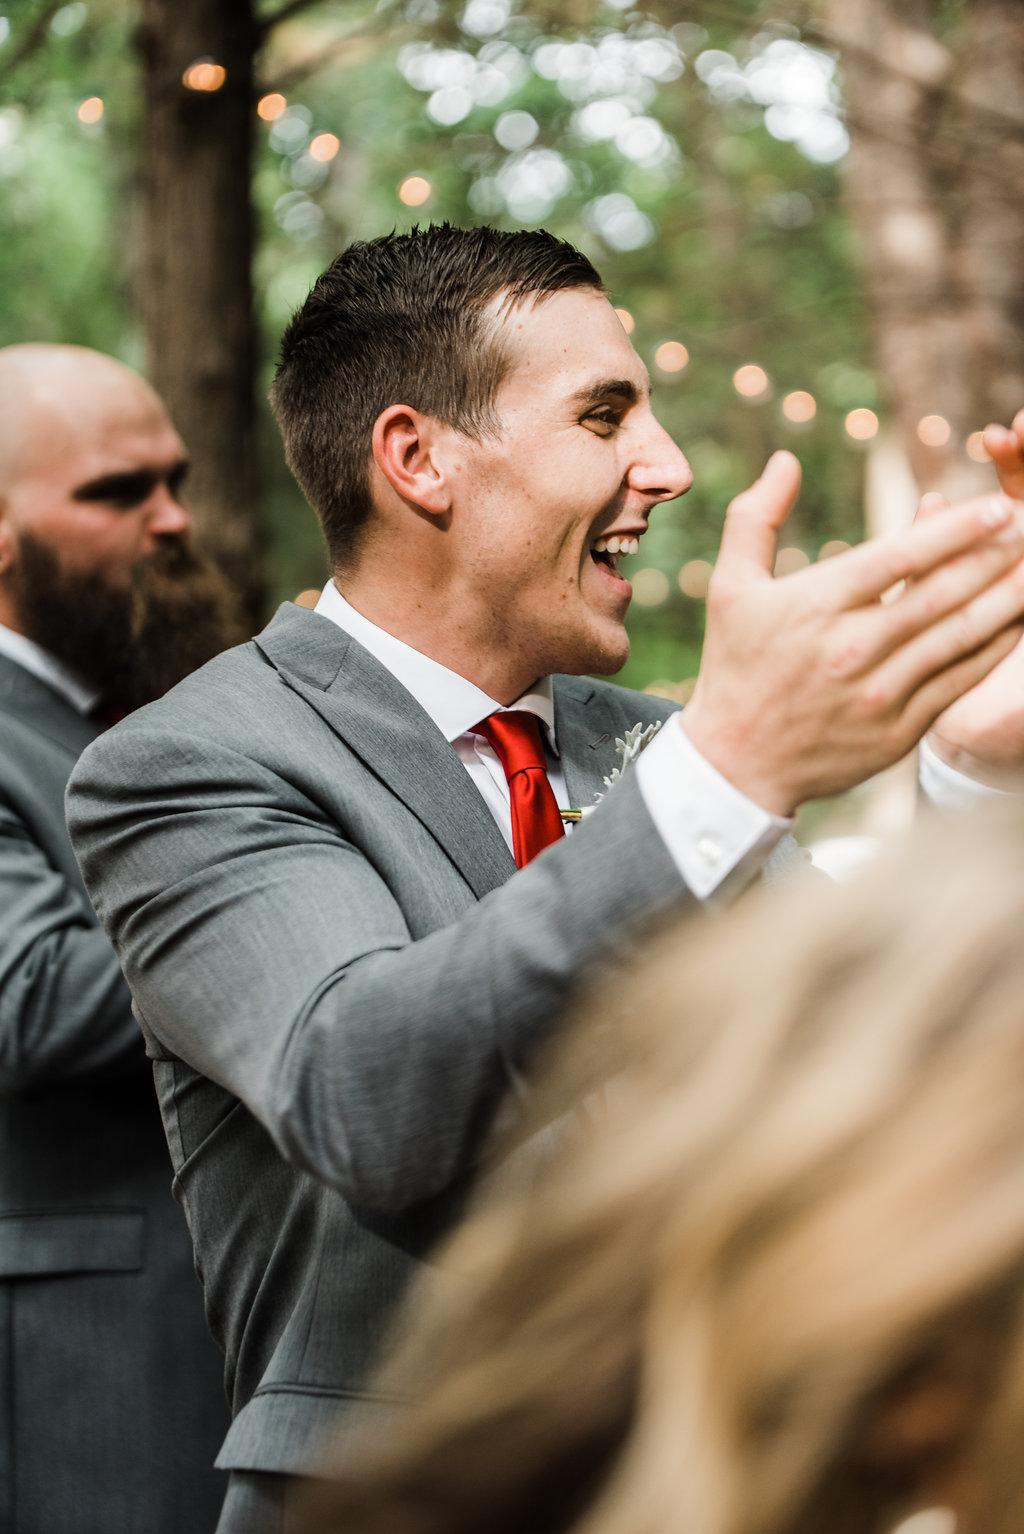 Lexi-Colby-Wedding-2622.jpg